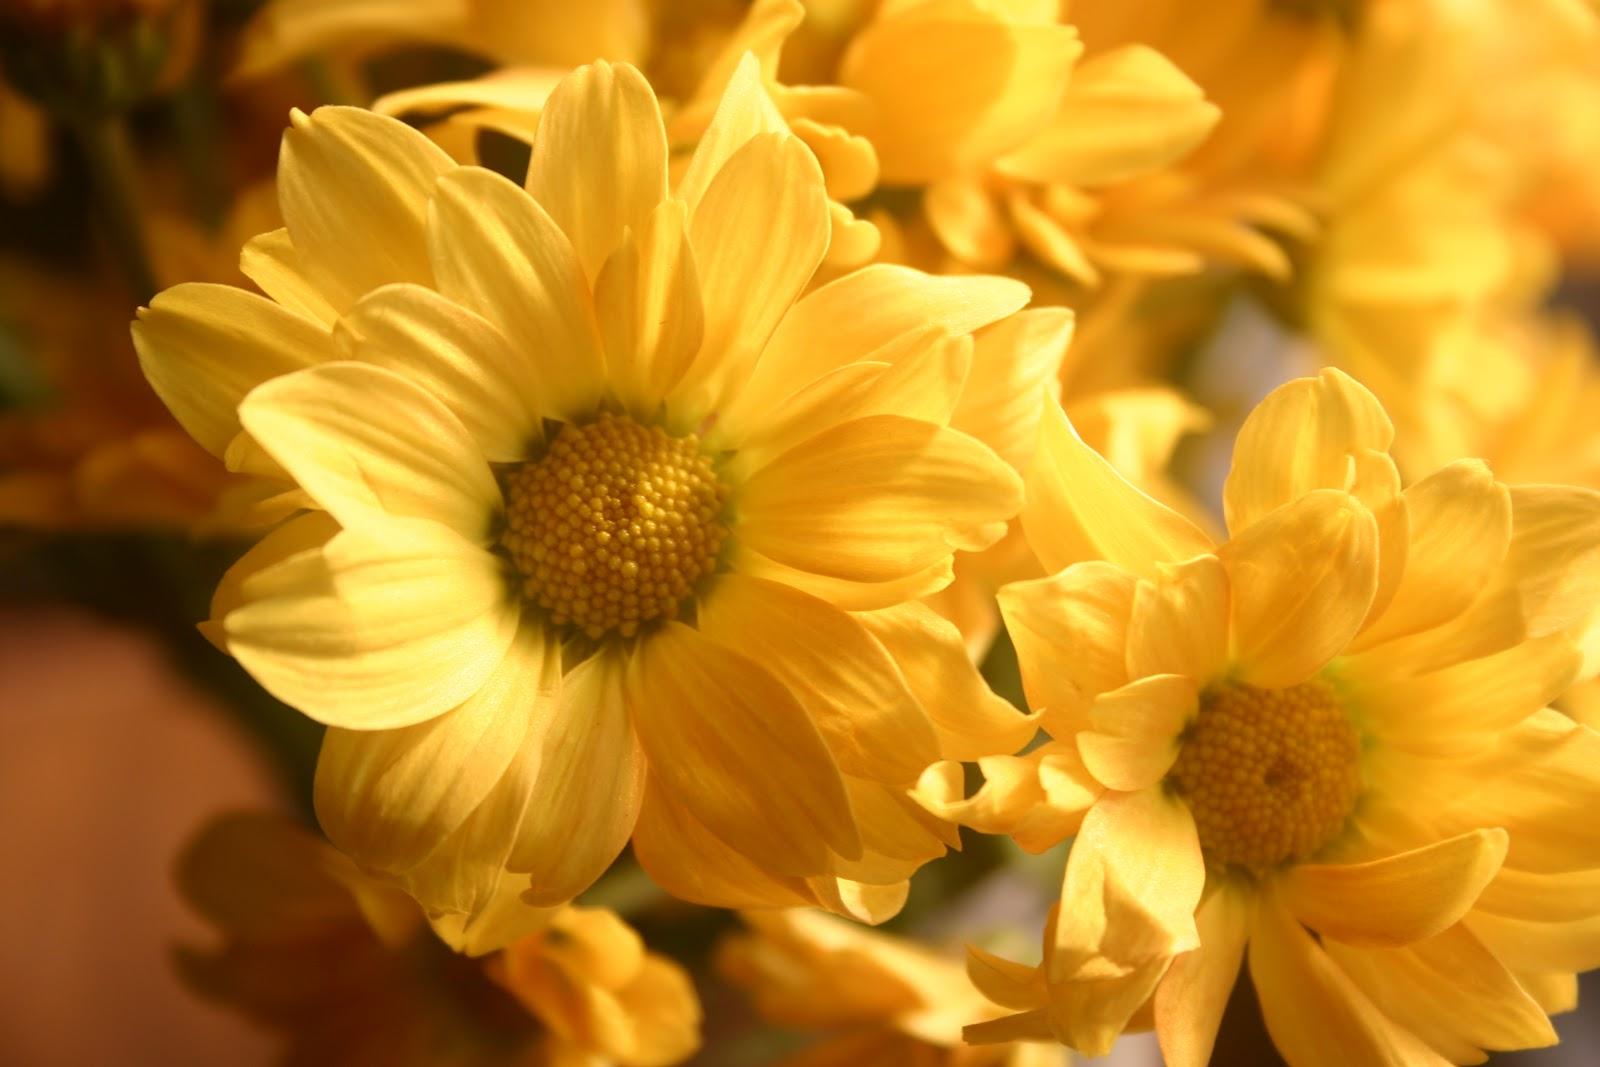 Flowers Of Quiet Happiness Weird Things Cute Kids Summer Ending